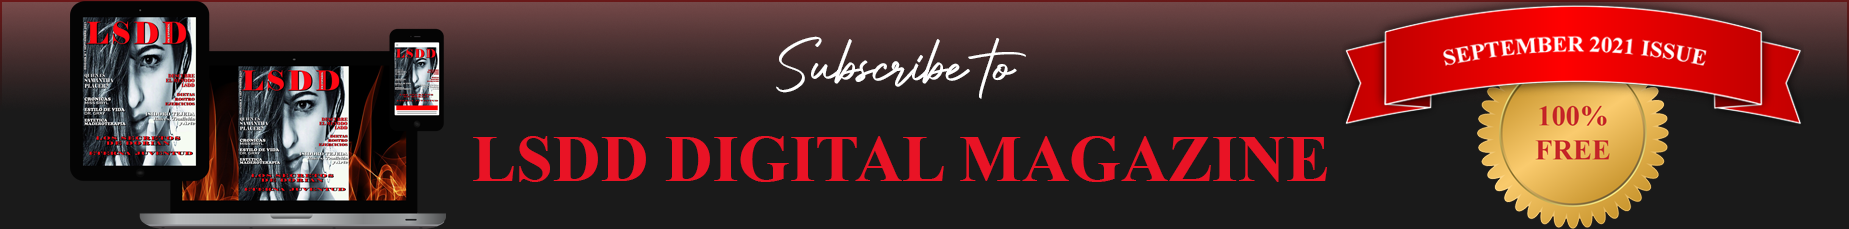 Subscribe to LSDD Magazine Dorian's Secrets